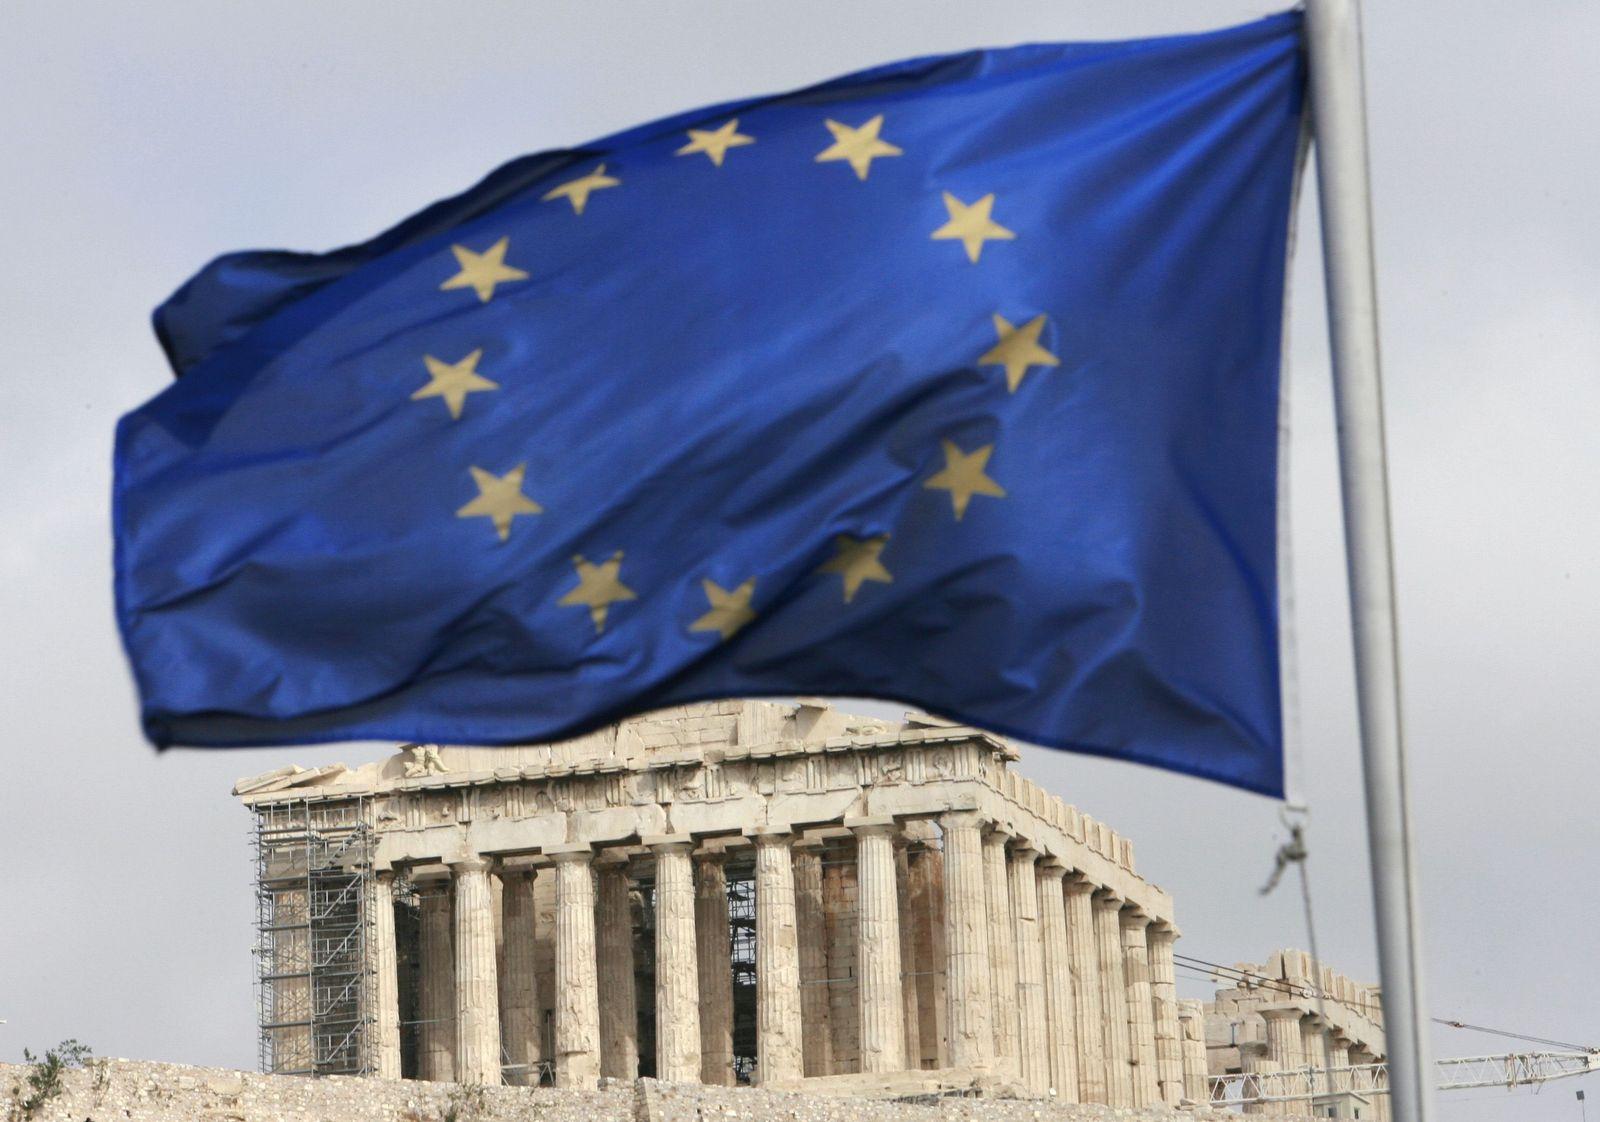 Griechenland / Flagge / Europäische Union